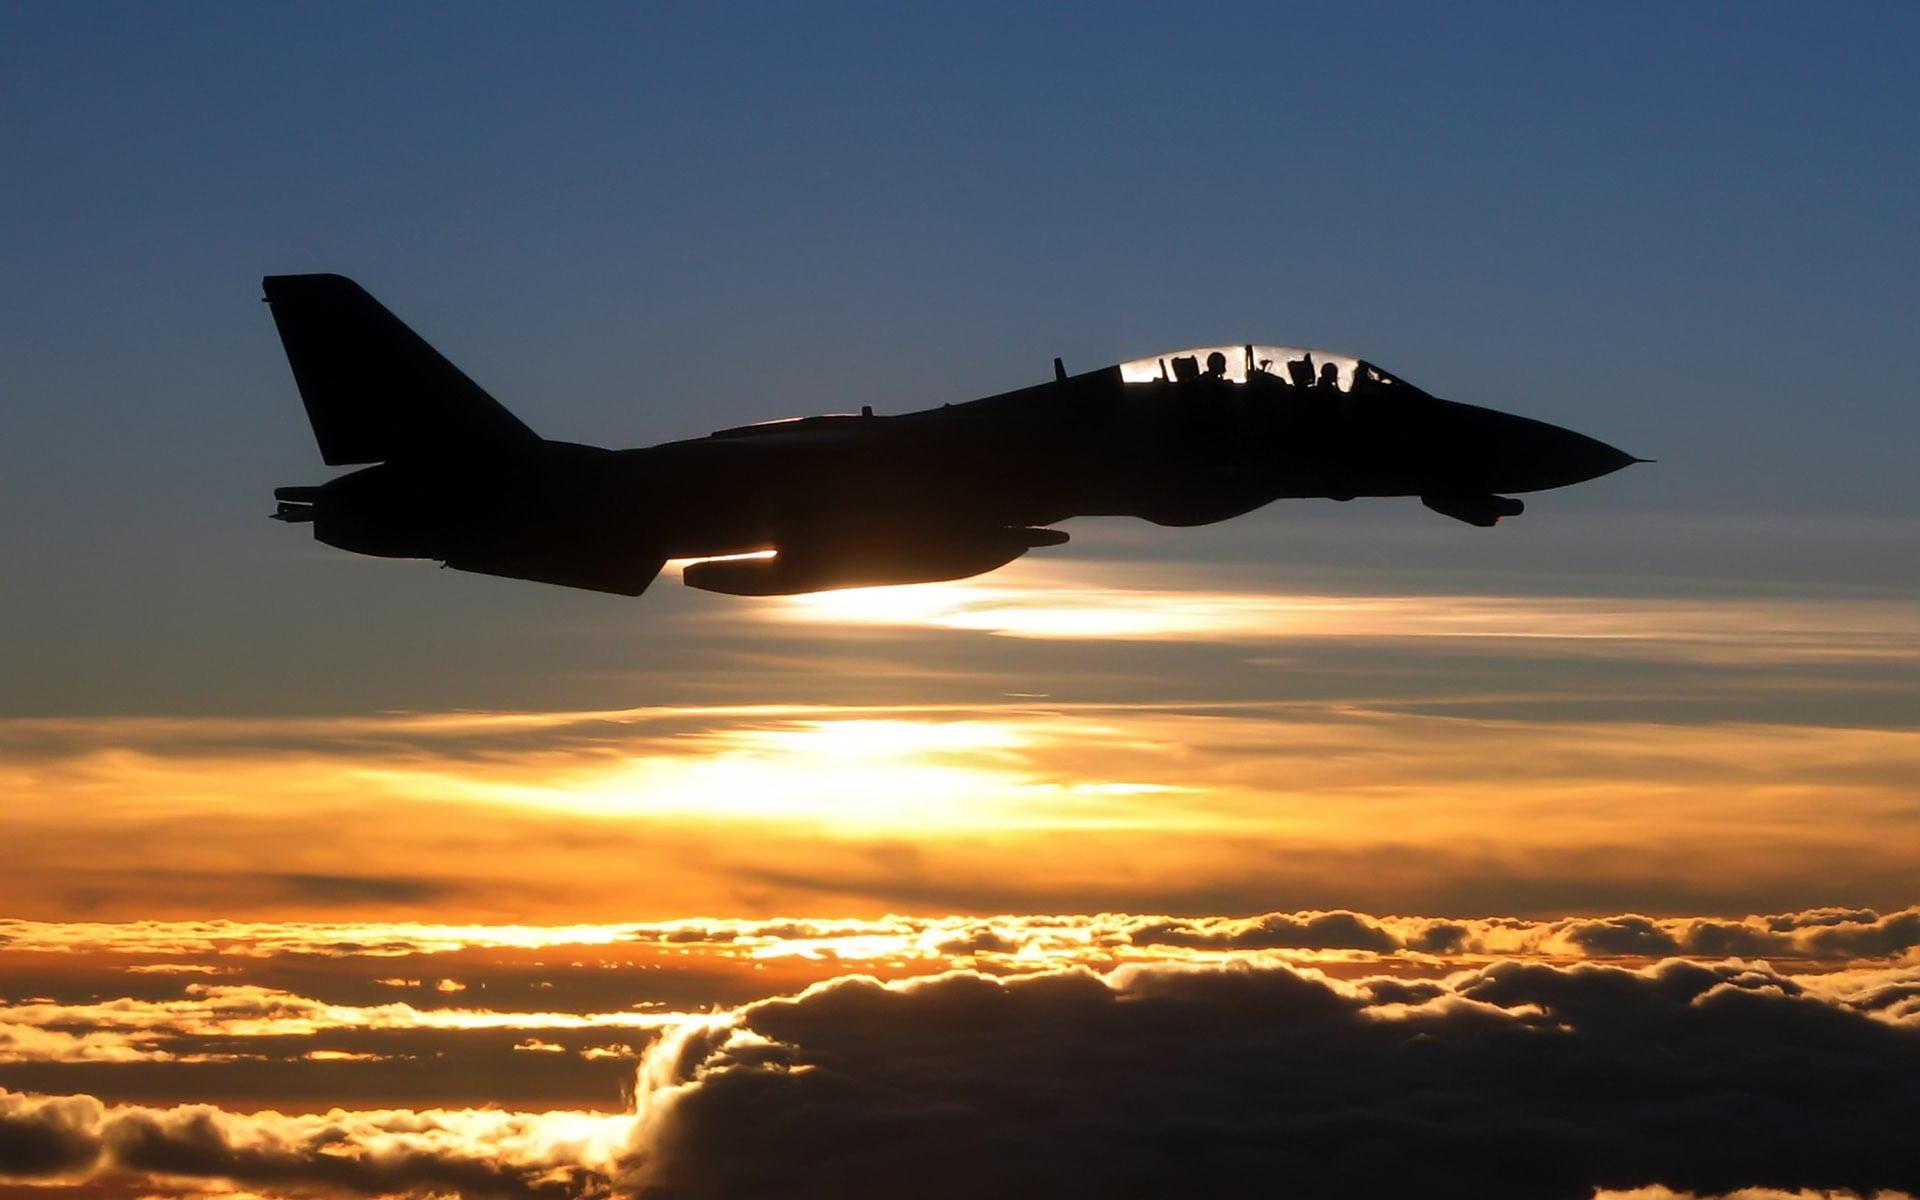 Black monoplane airplane sunset Grumman F 14 Tomcat silhouette 1920x1200